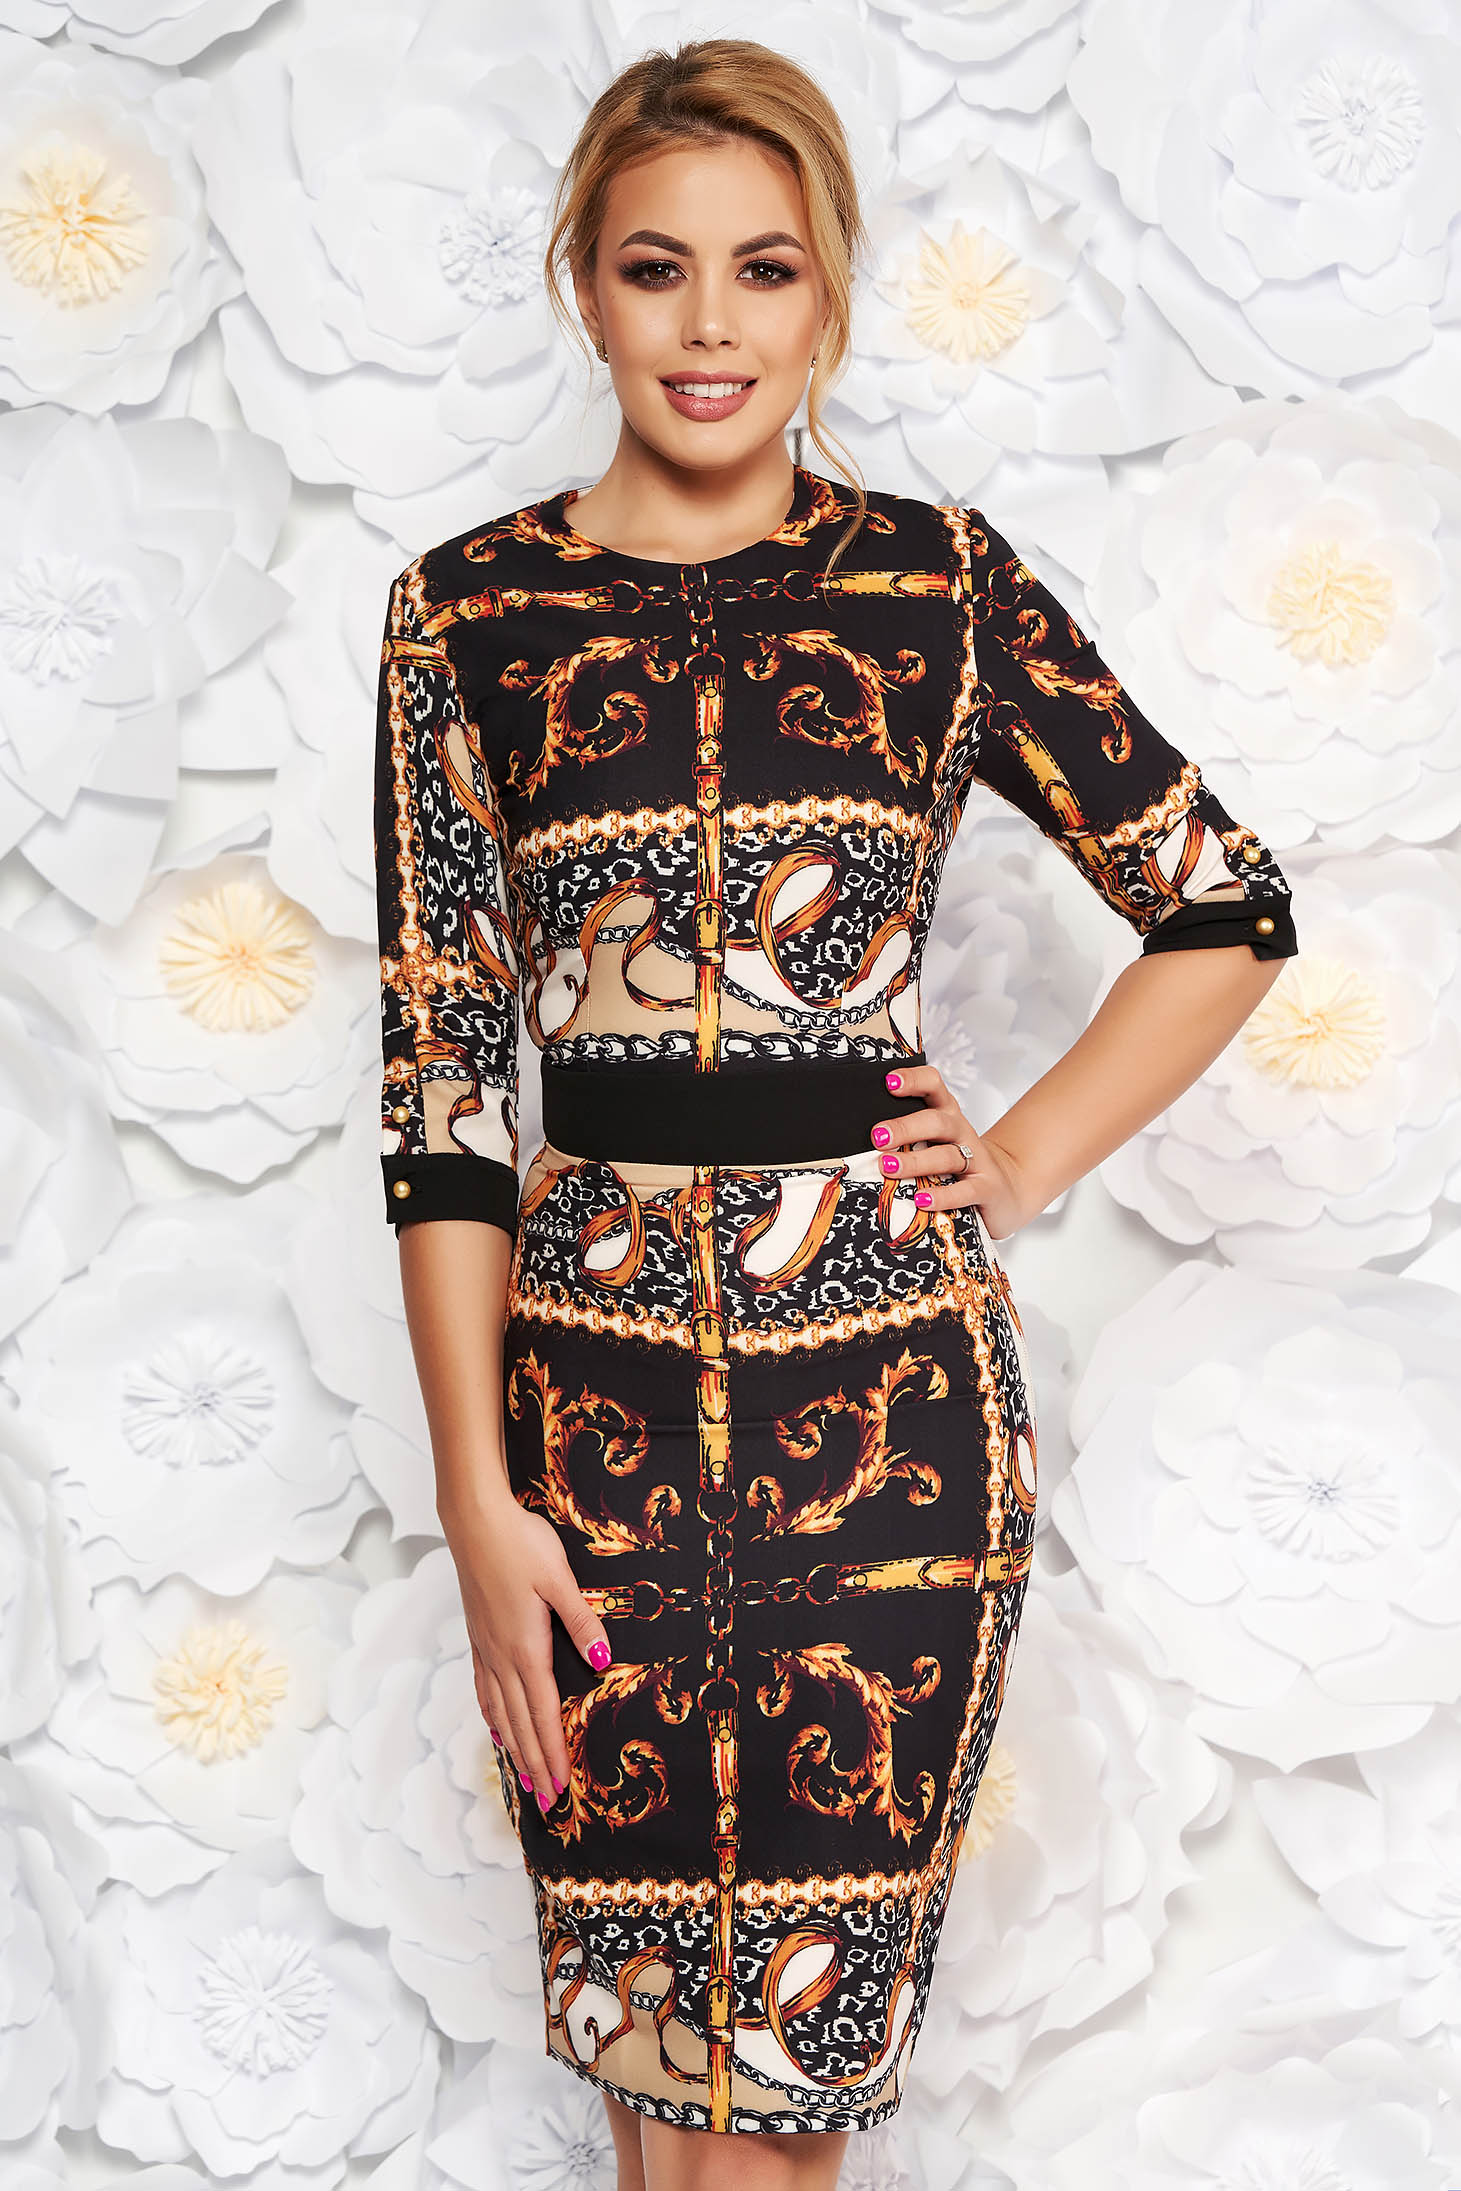 PrettyGirl black daily midi pencil dress slightly elastic fabric with 3/4 sleeves